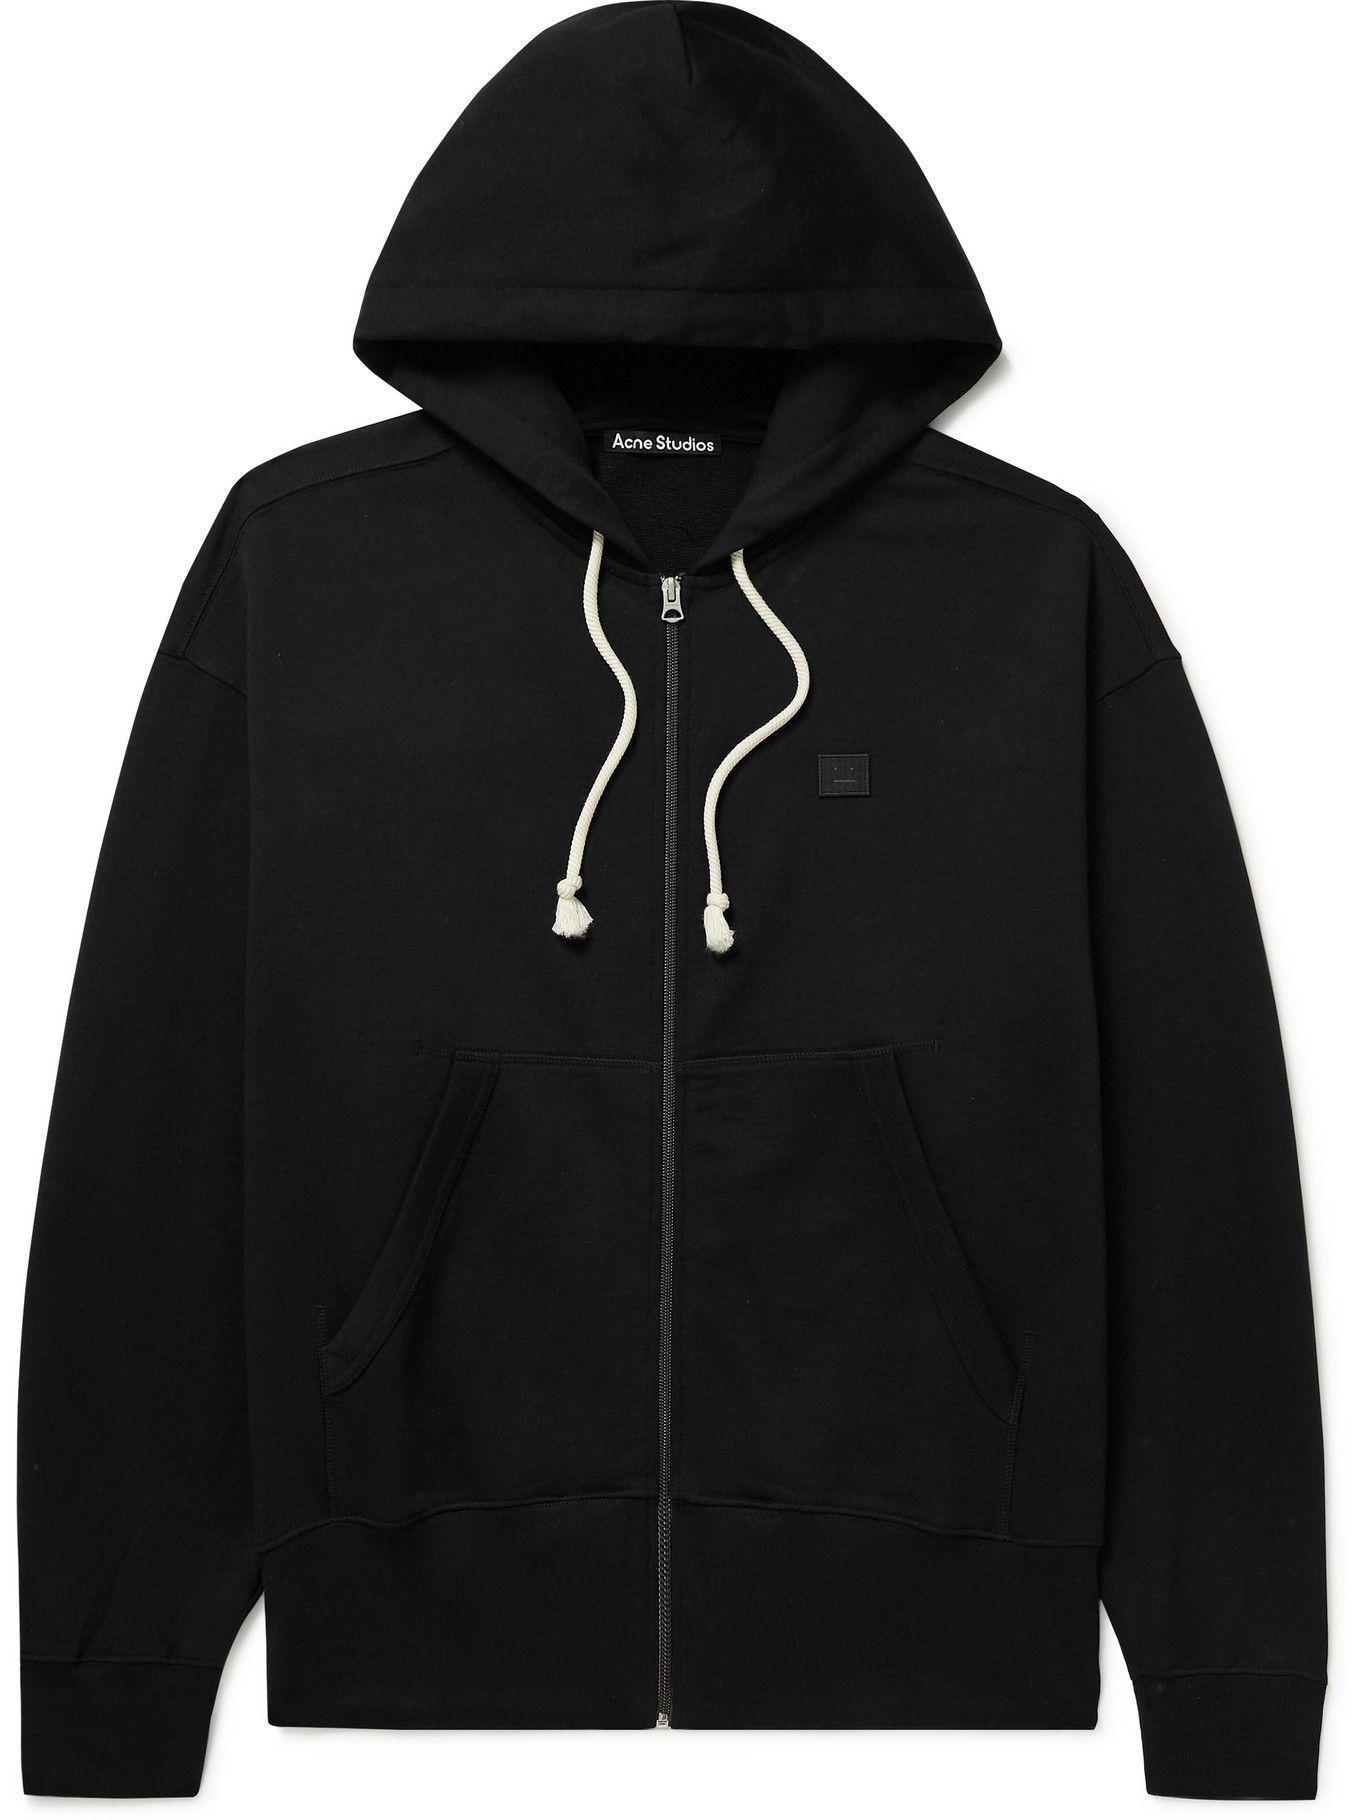 Photo: ACNE STUDIOS - Logo-Appliquéd Cotton-Jersey Zip-Up Hoodie - Black